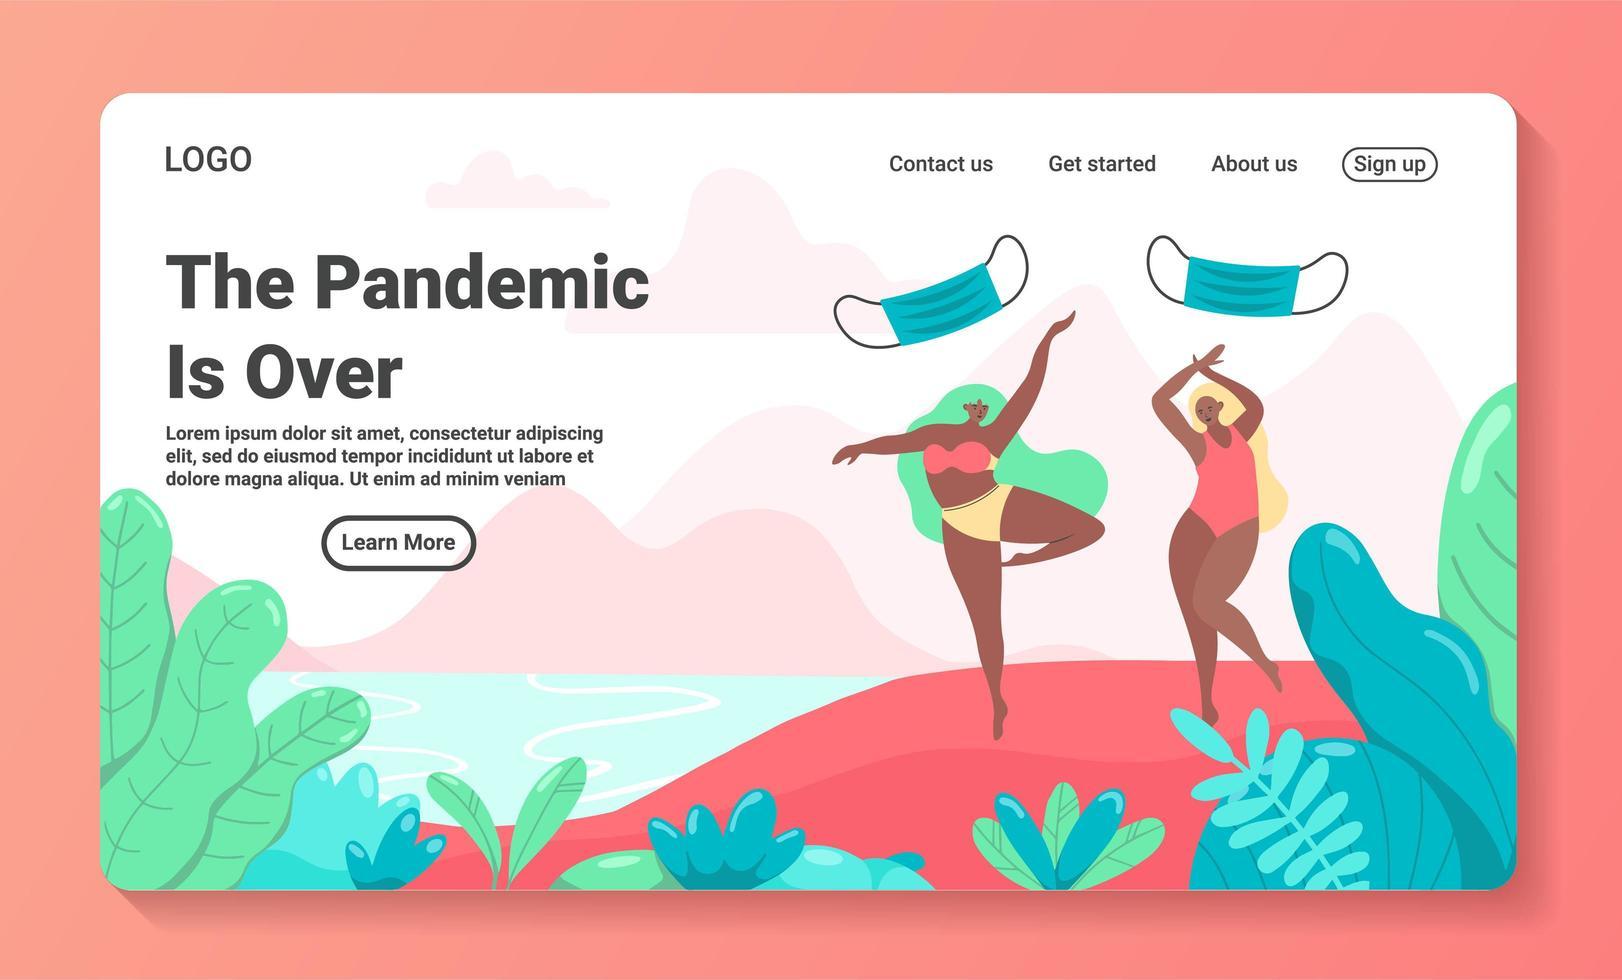 pandemia terminou o modelo de página de destino do conceito vetor